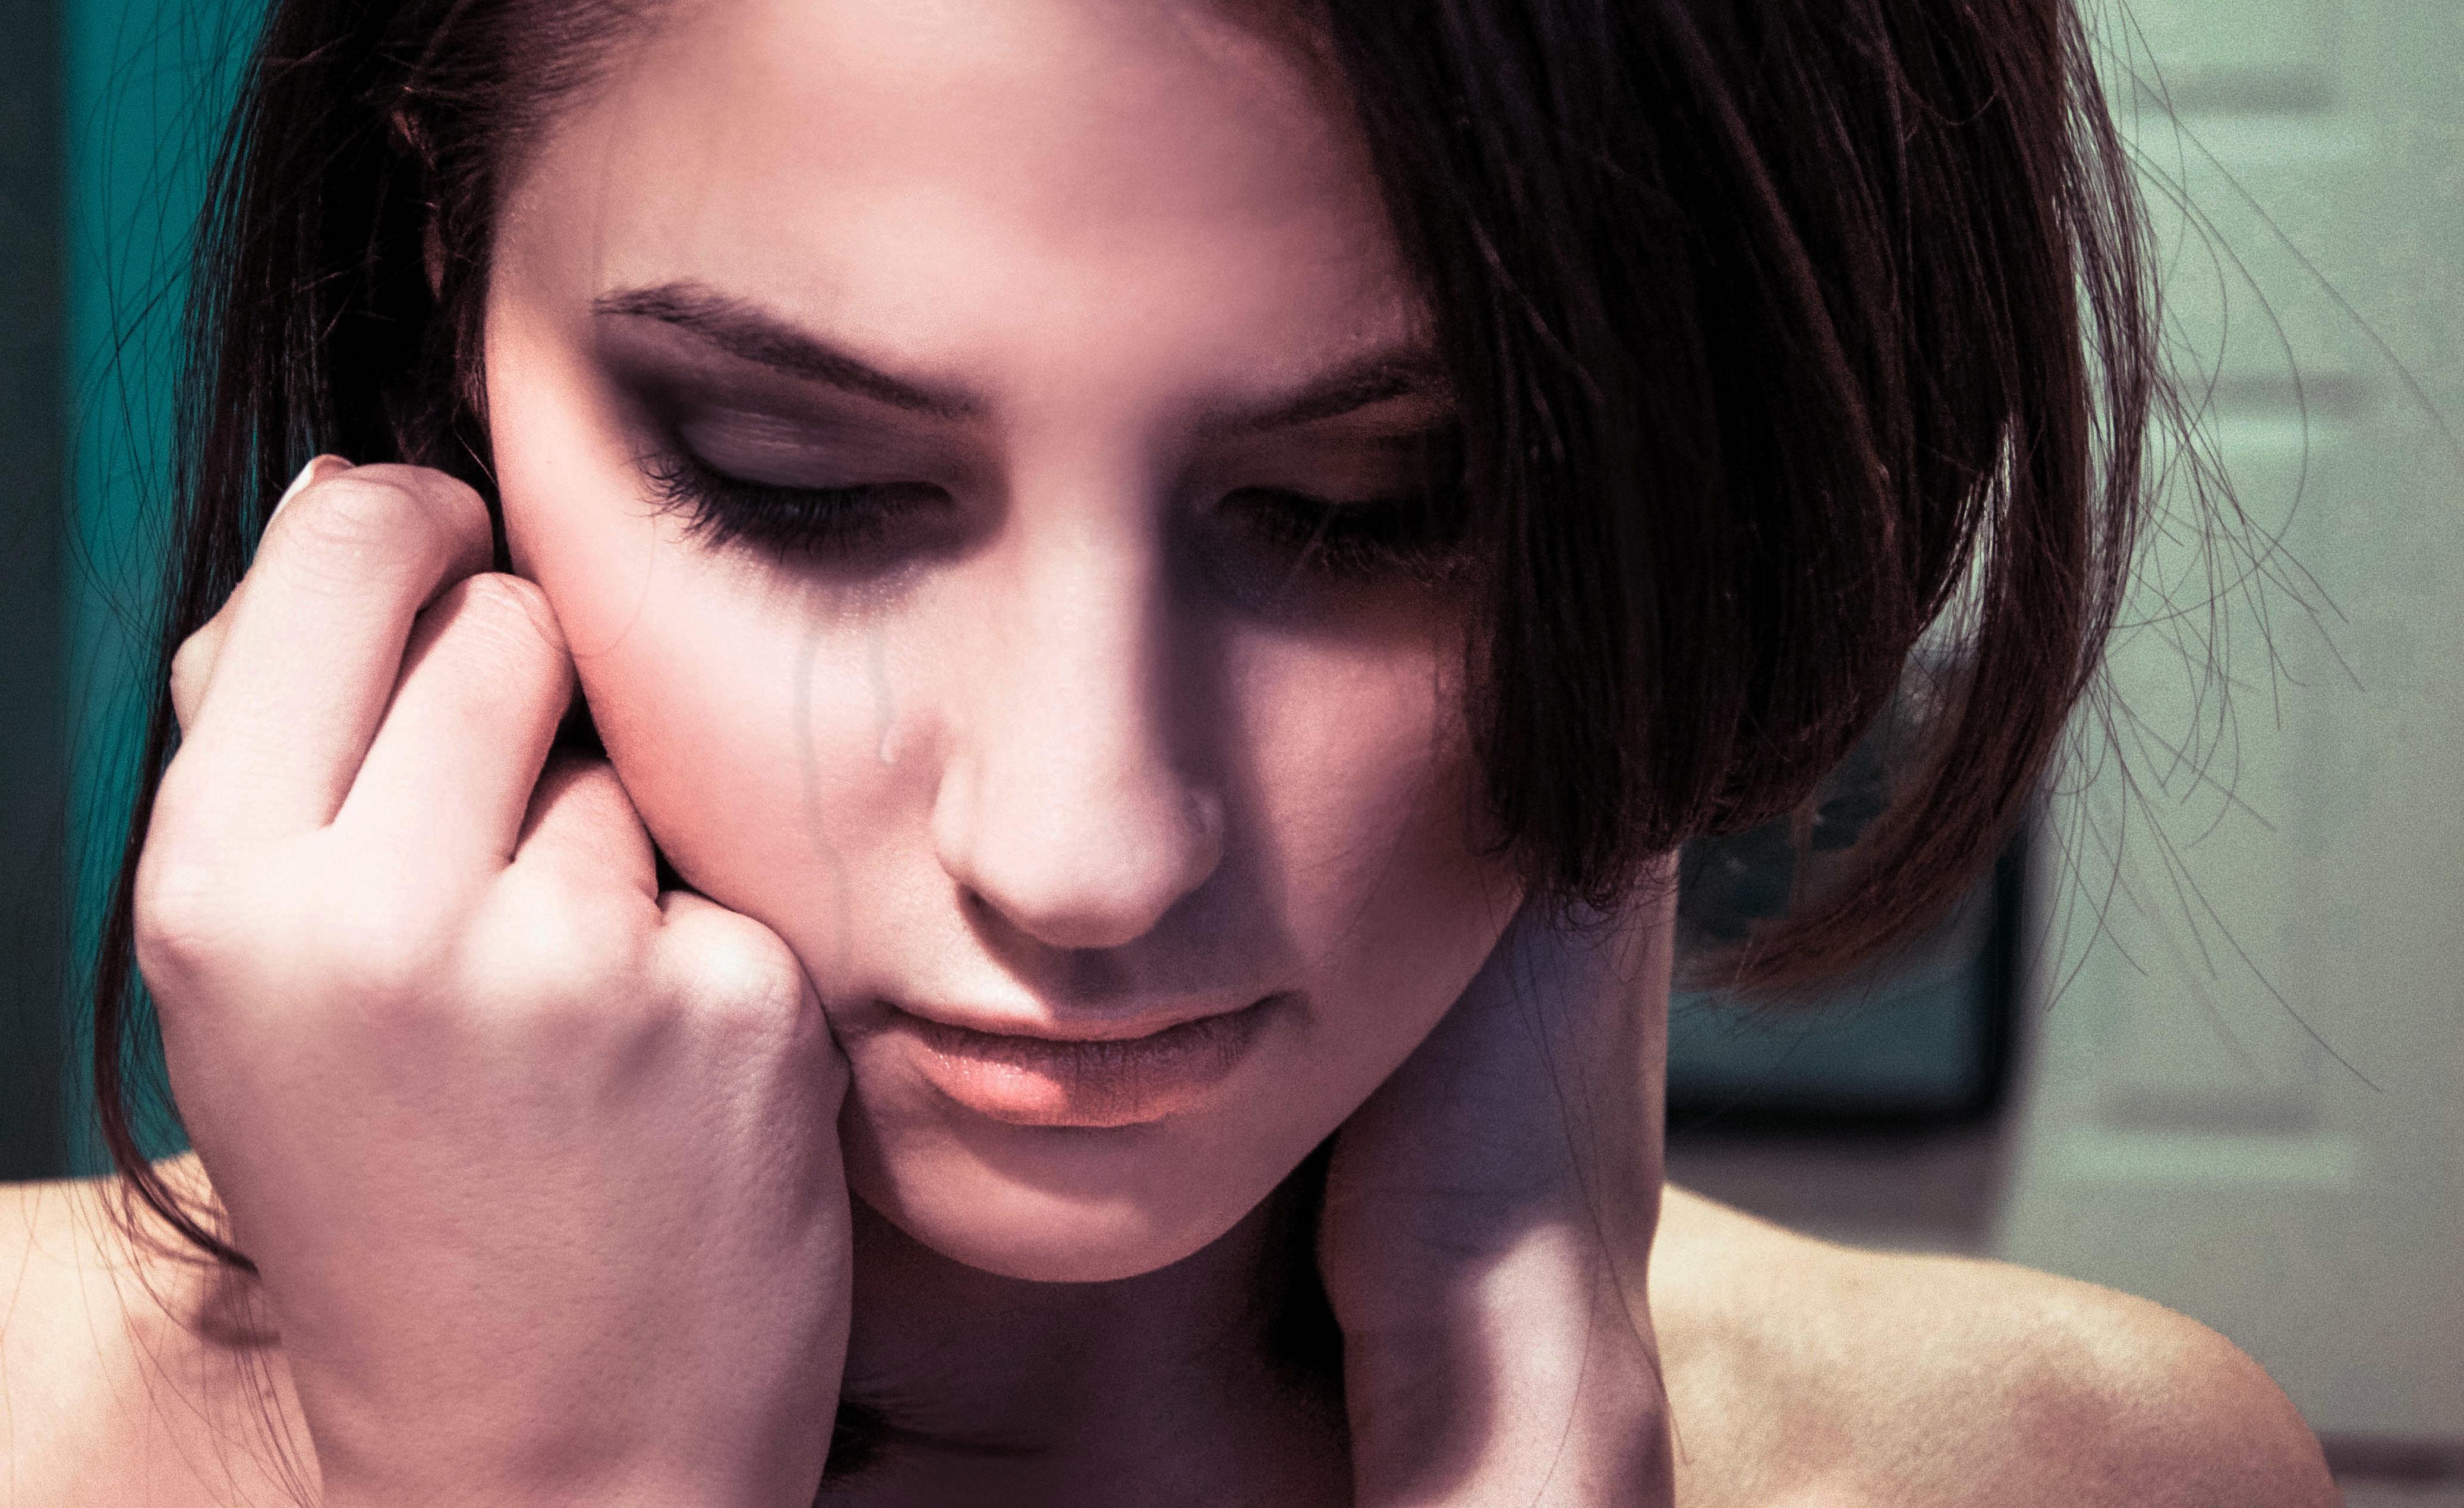 Картинки женщины плачущие